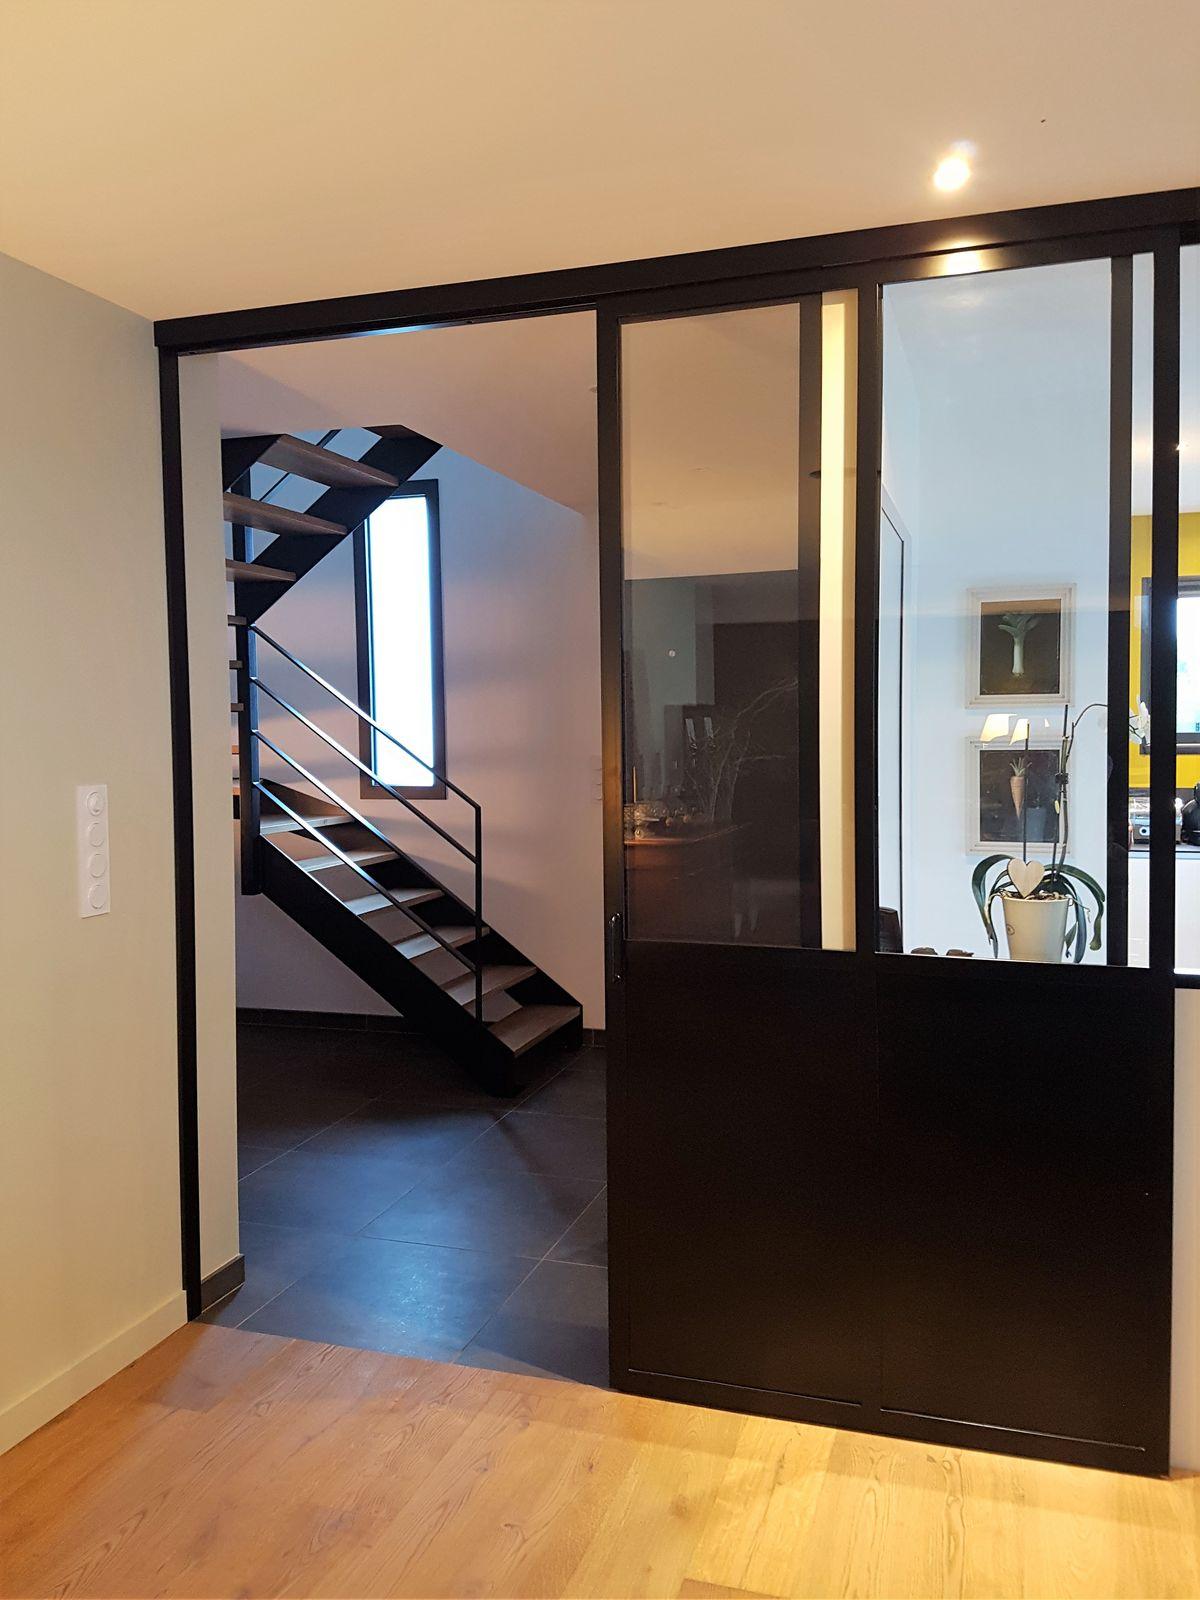 verri re interieure sur mesure m tallerie martin. Black Bedroom Furniture Sets. Home Design Ideas